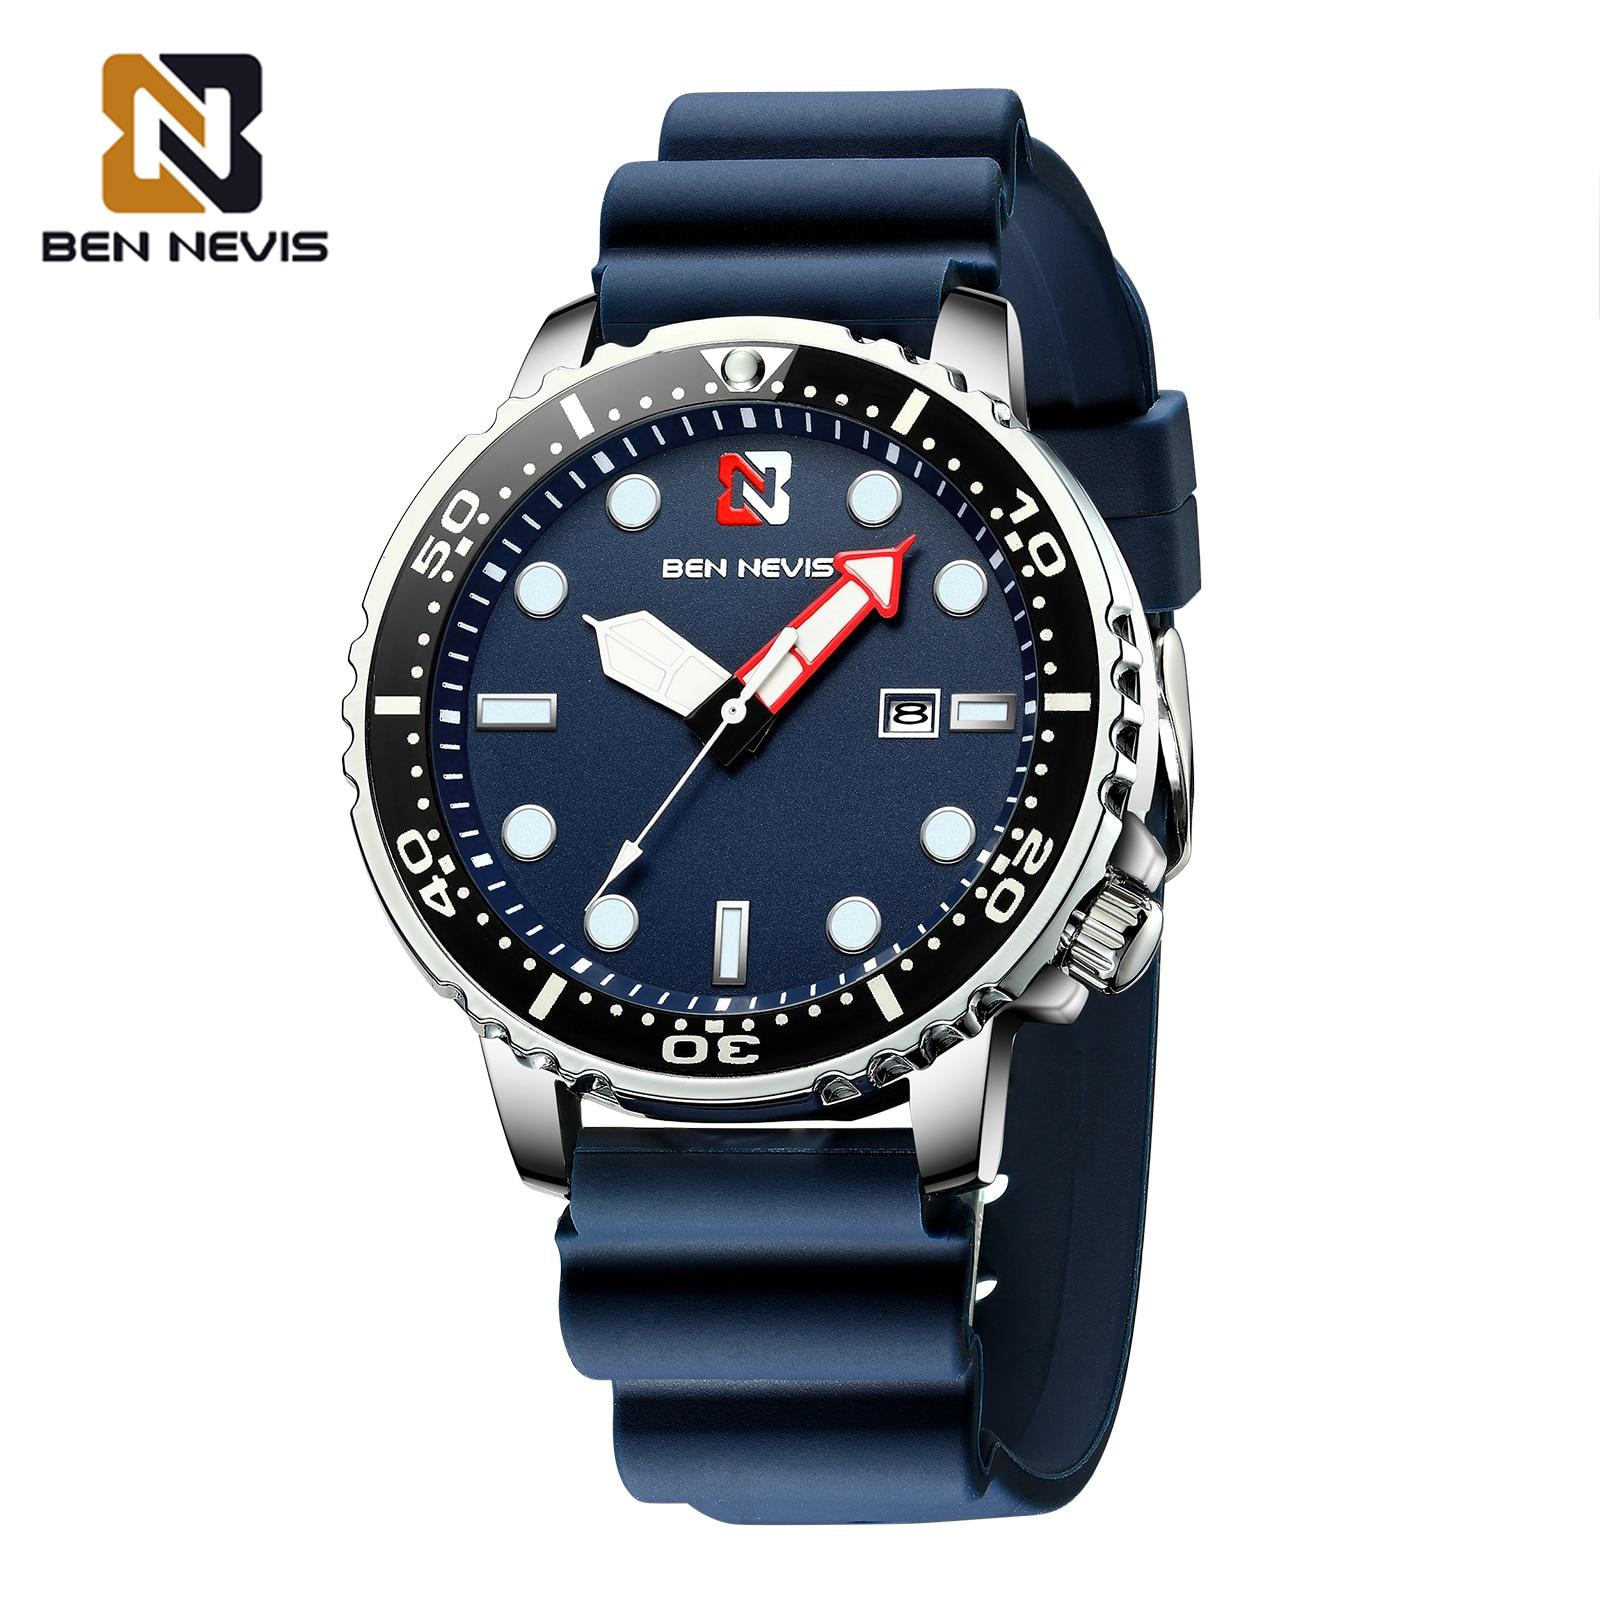 Ben Nevis cuarzo de los hombres reloj con fecha correa de caucho de silicona de impermeable azul deporte reloj para hombre, relojes masculino A5